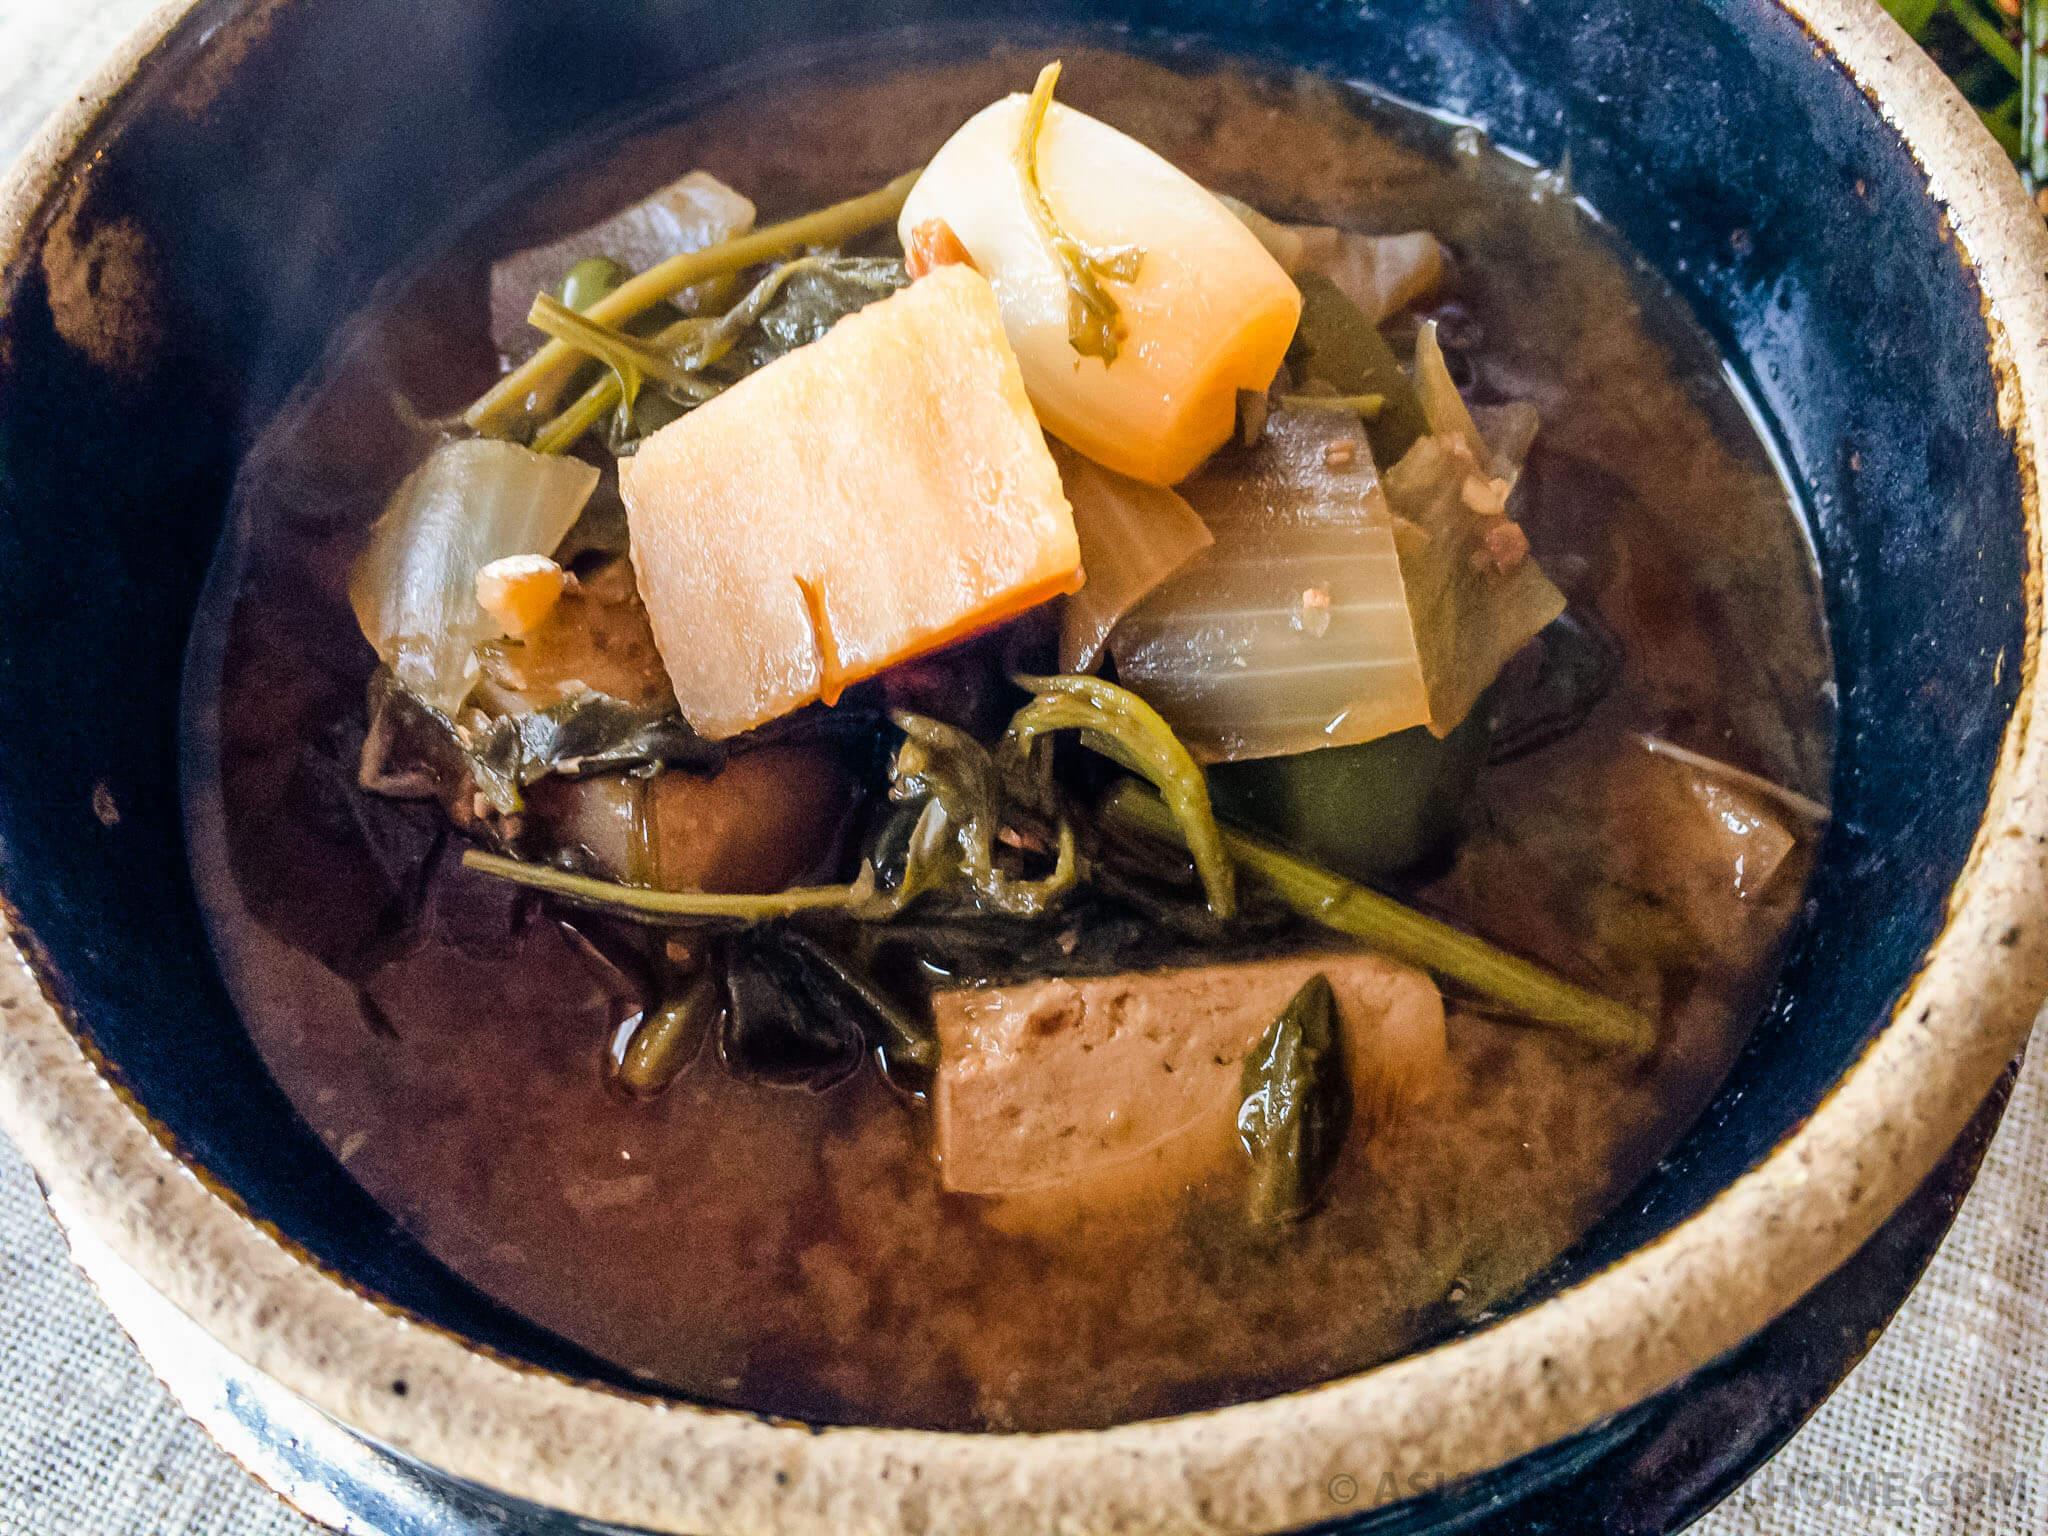 This Korean soybean paste stew (doenjang guk) is filled with delicious mugwort greens, wild Korean chives, tofu, potatoes, and the salty/umami flavors of fermented soybean paste (doenjang).